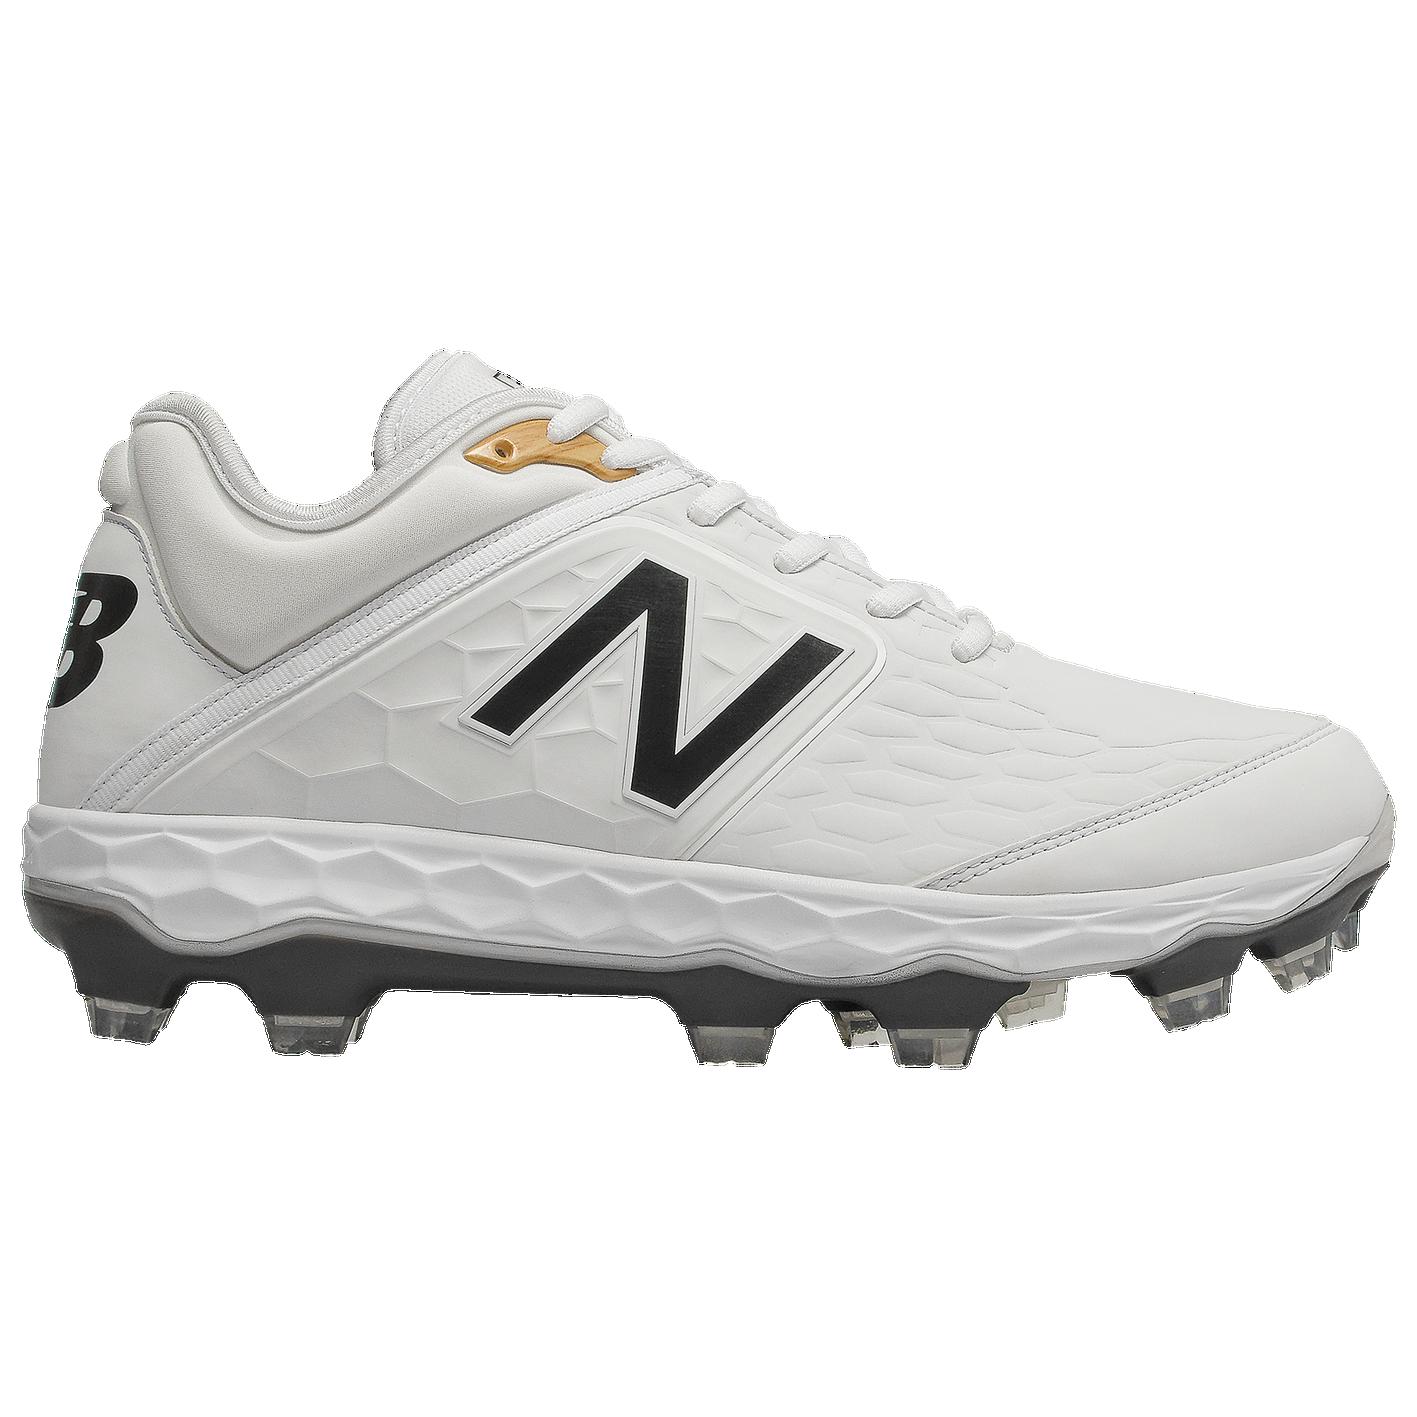 15148983c New Balance 3000v4 TPU Low - Men s - Baseball - Shoes - White